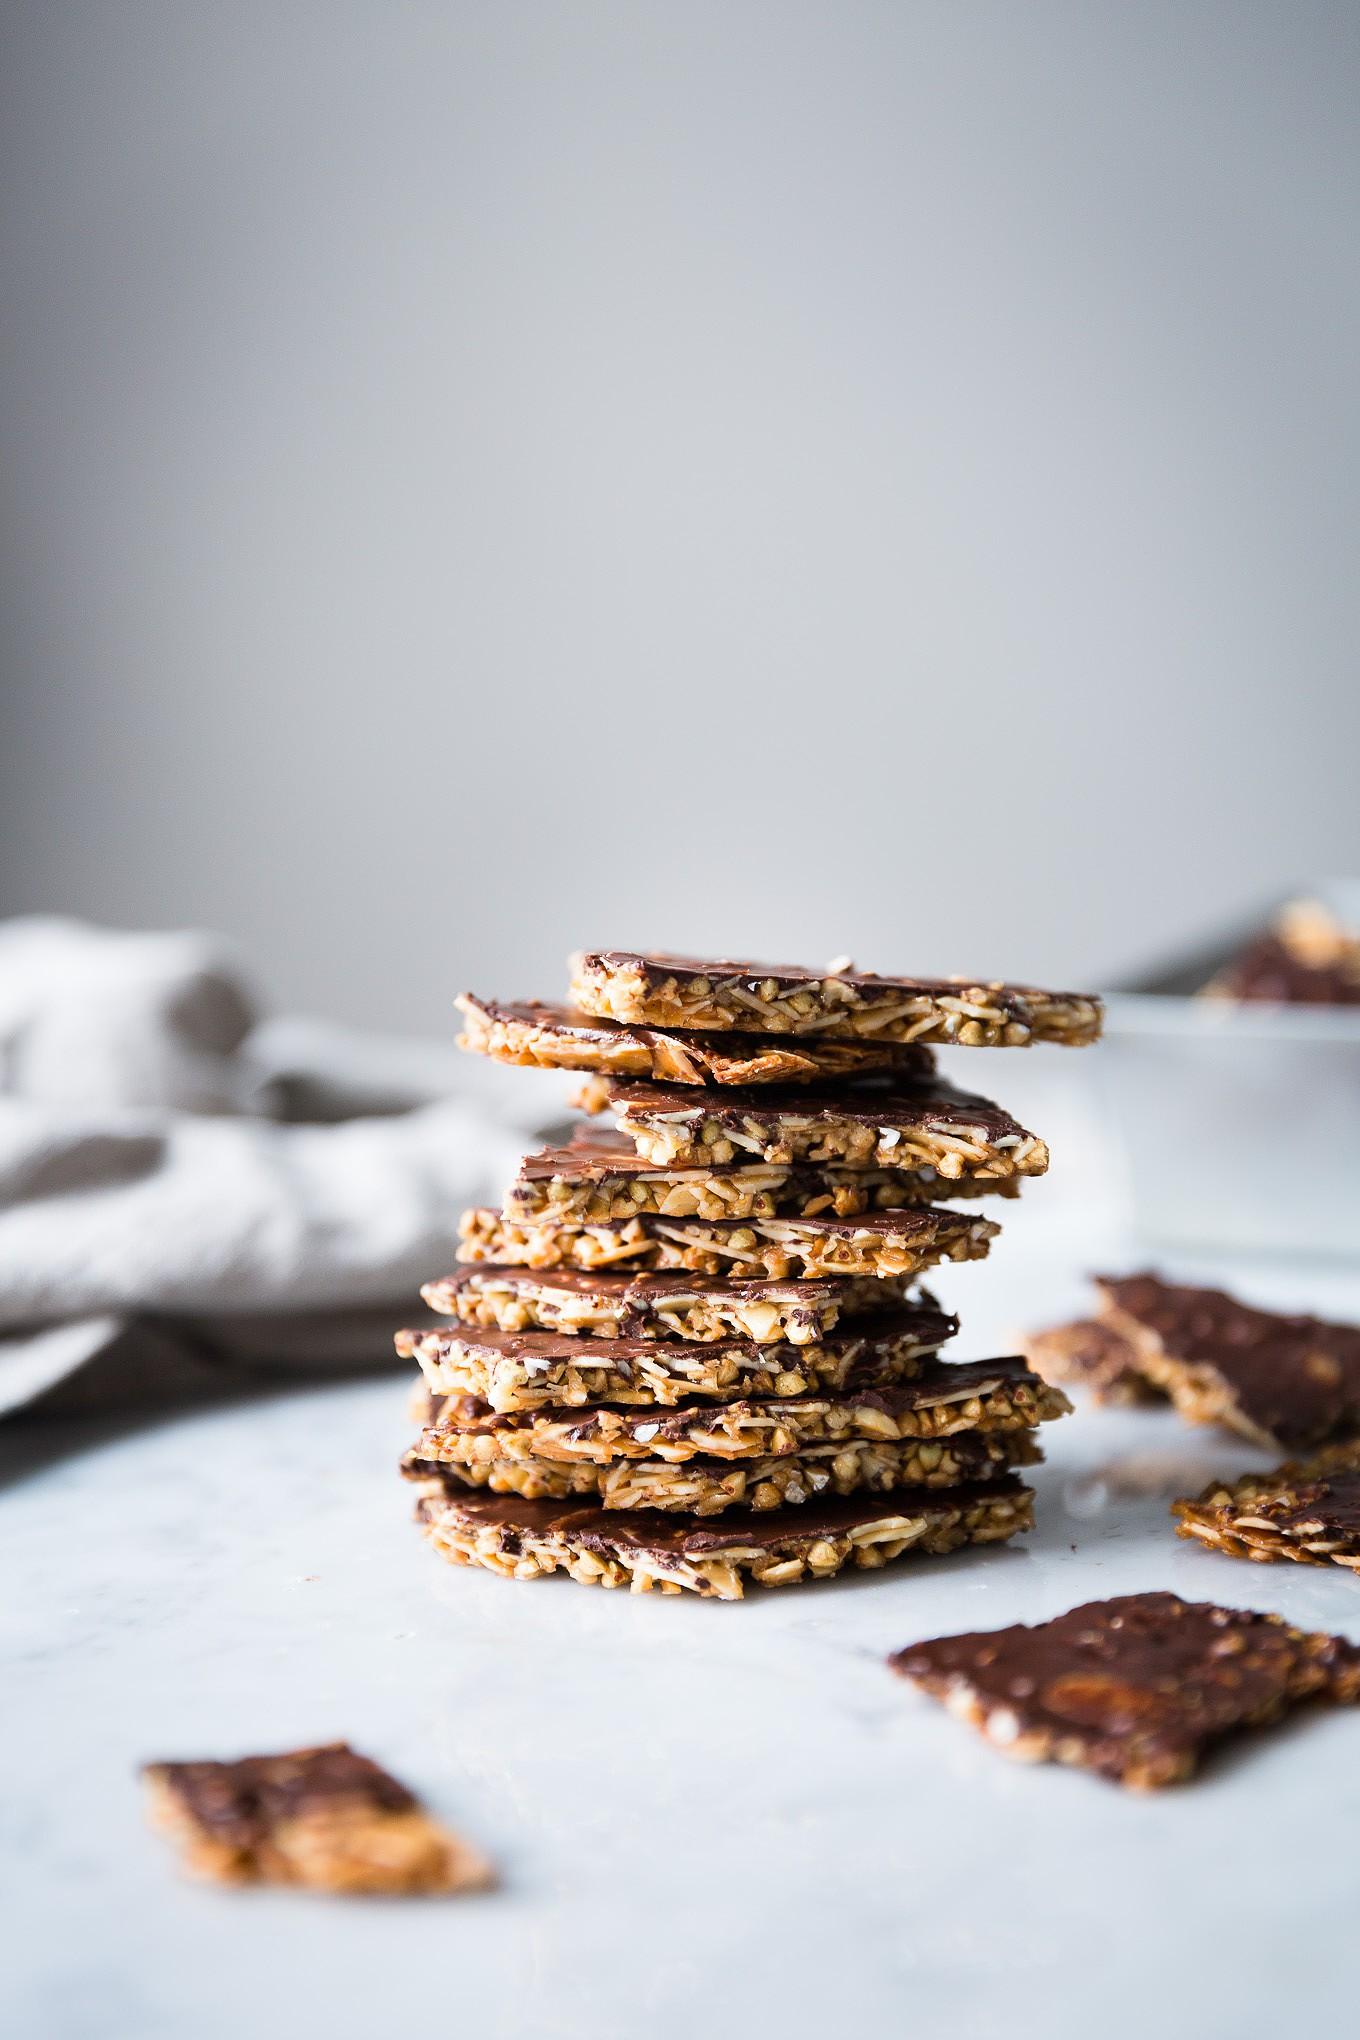 almond-buckwheat-chocolate-brittle-5.jpg